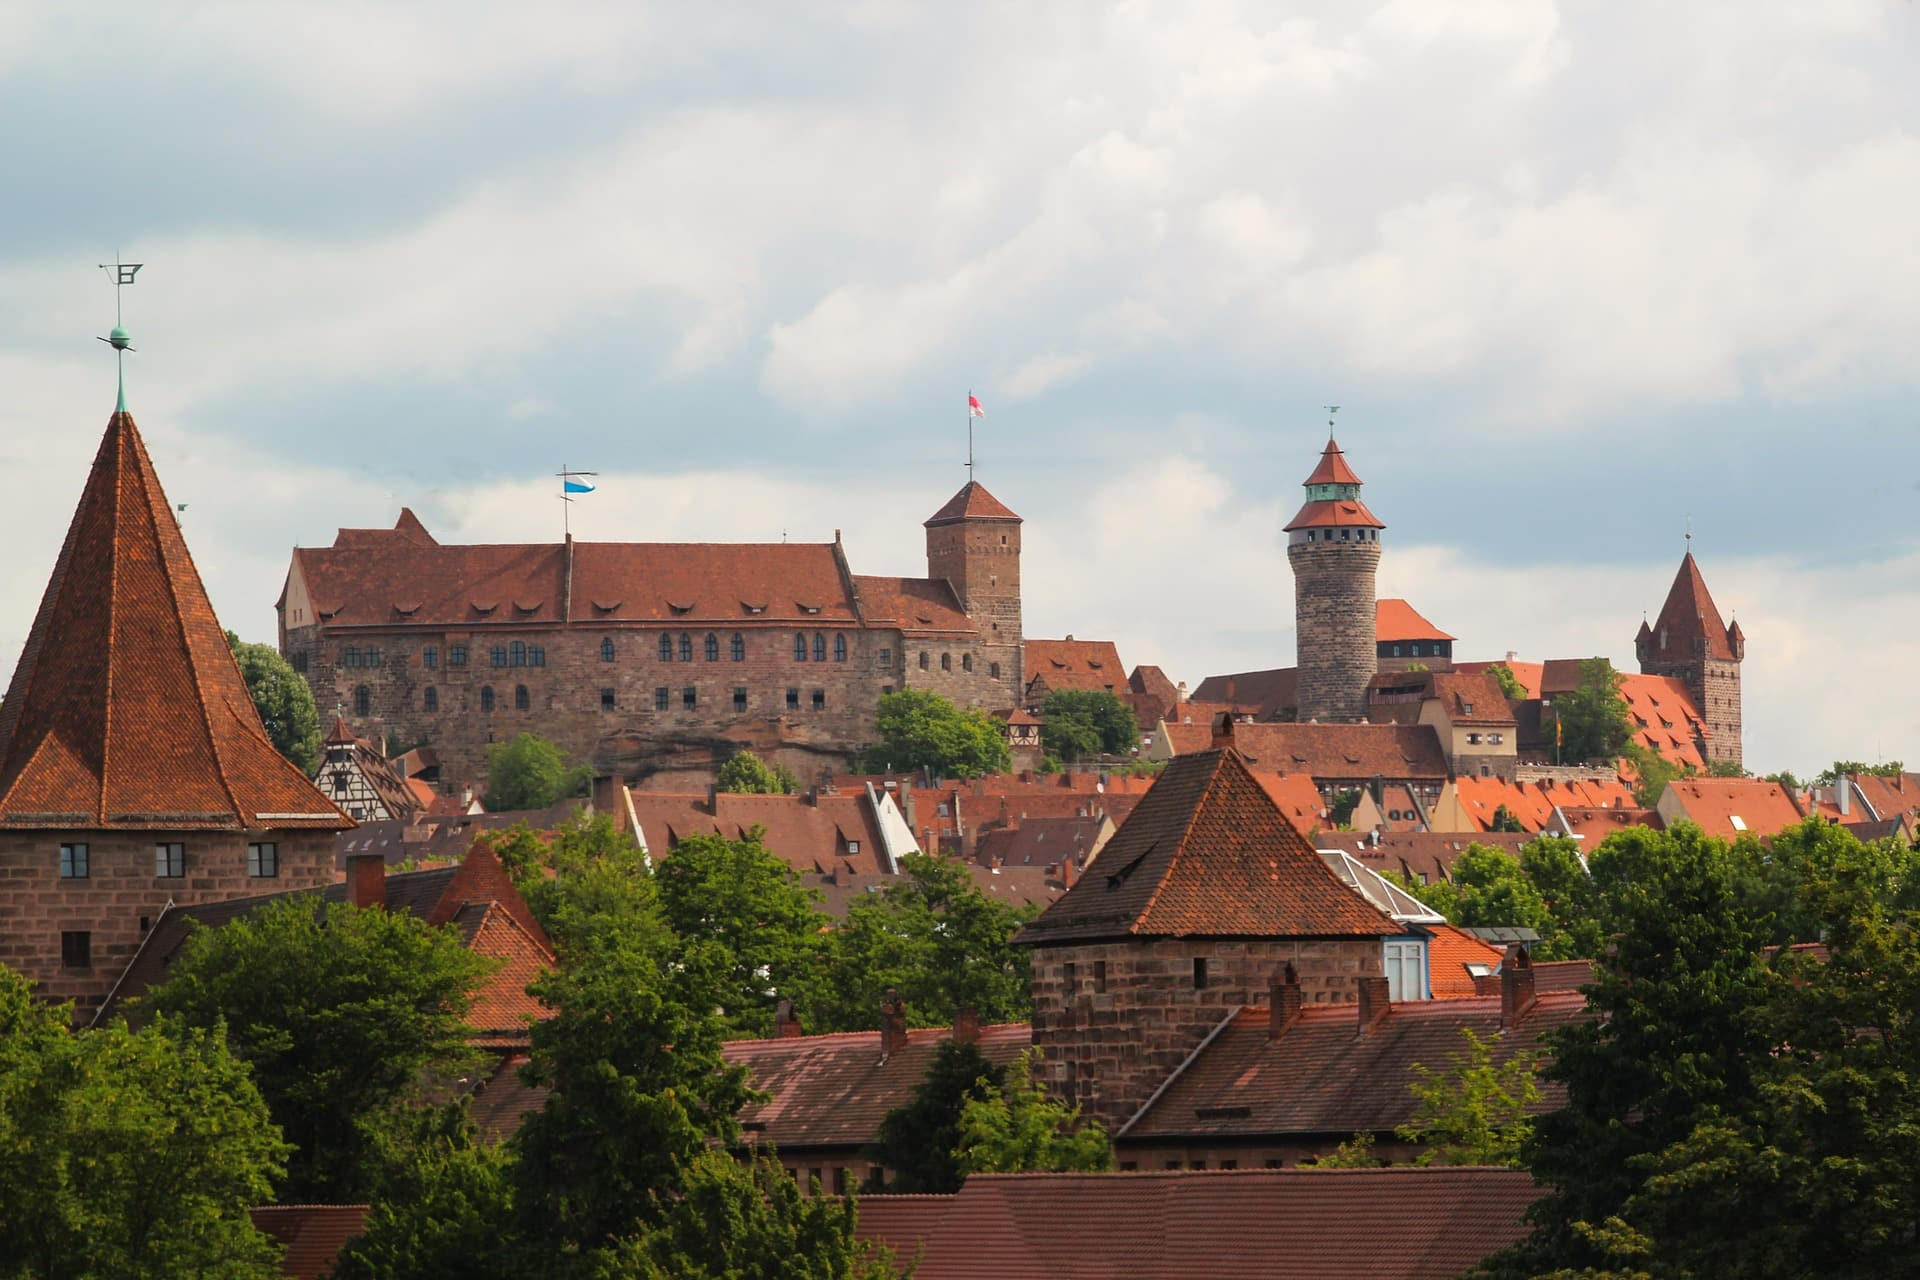 Nürnbergs Sehenswürdigkeiten Ausflugsziele in Nürnberg